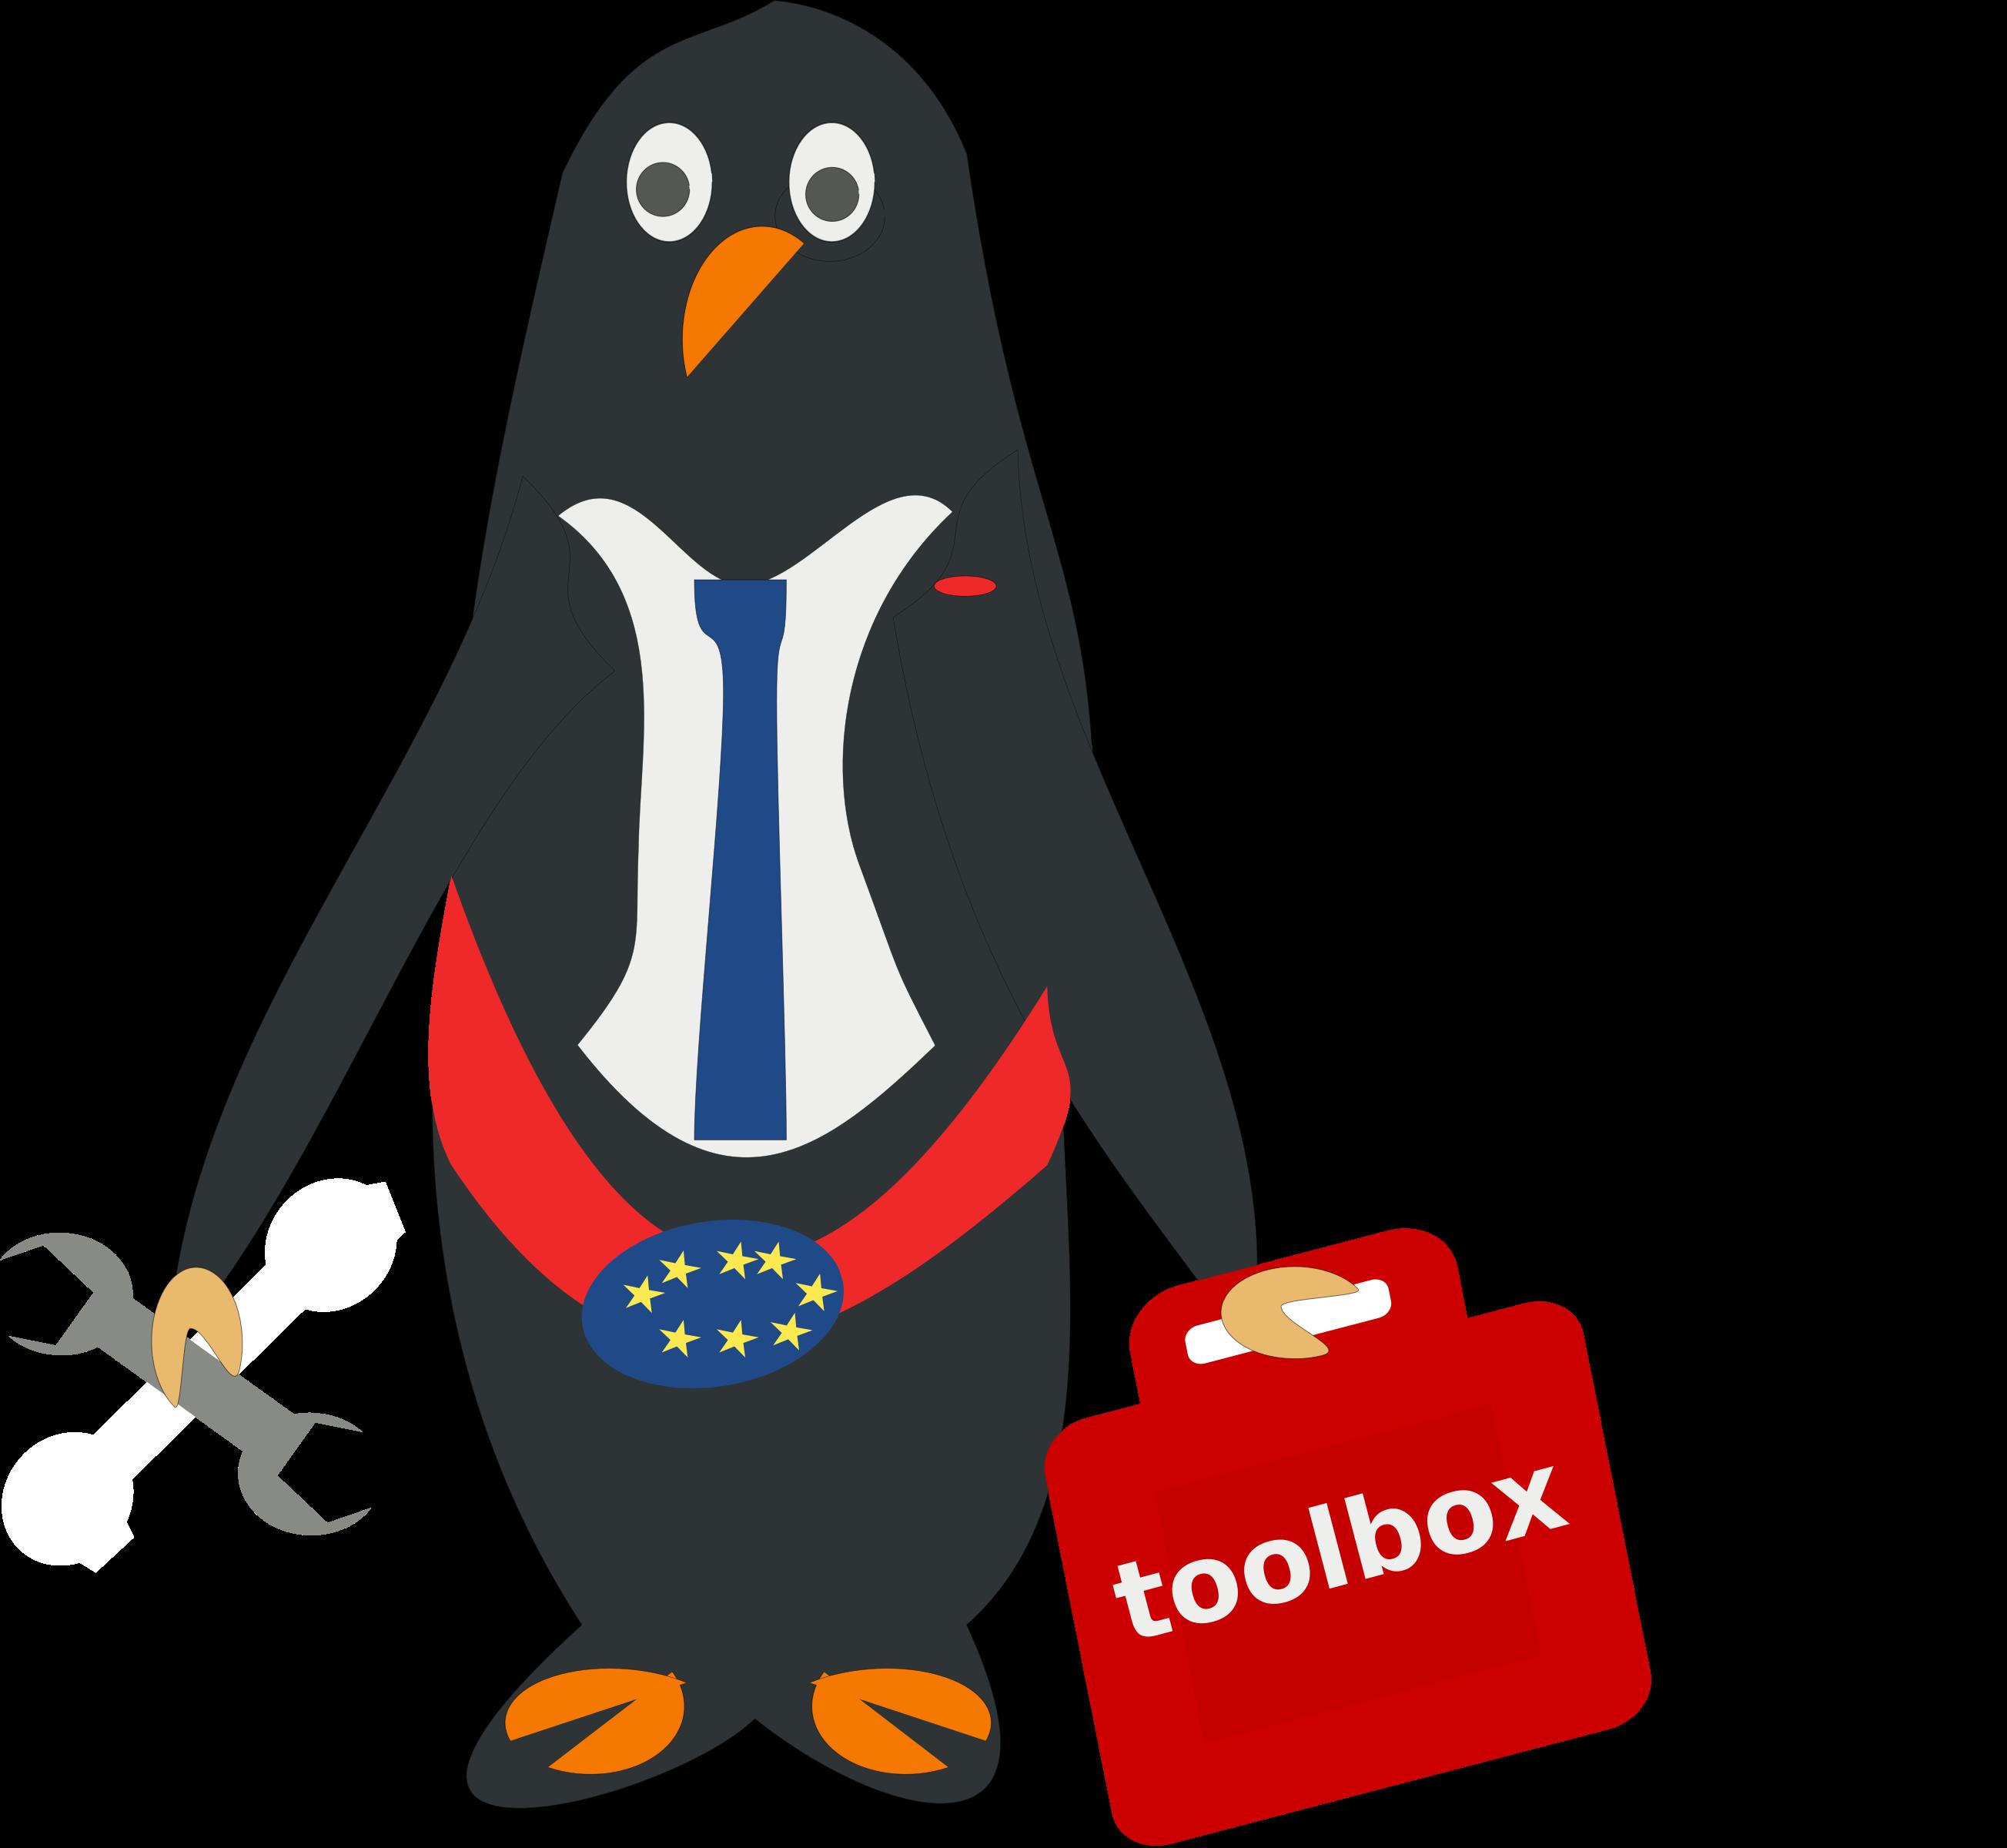 Politics clipart president. Of penguins big image